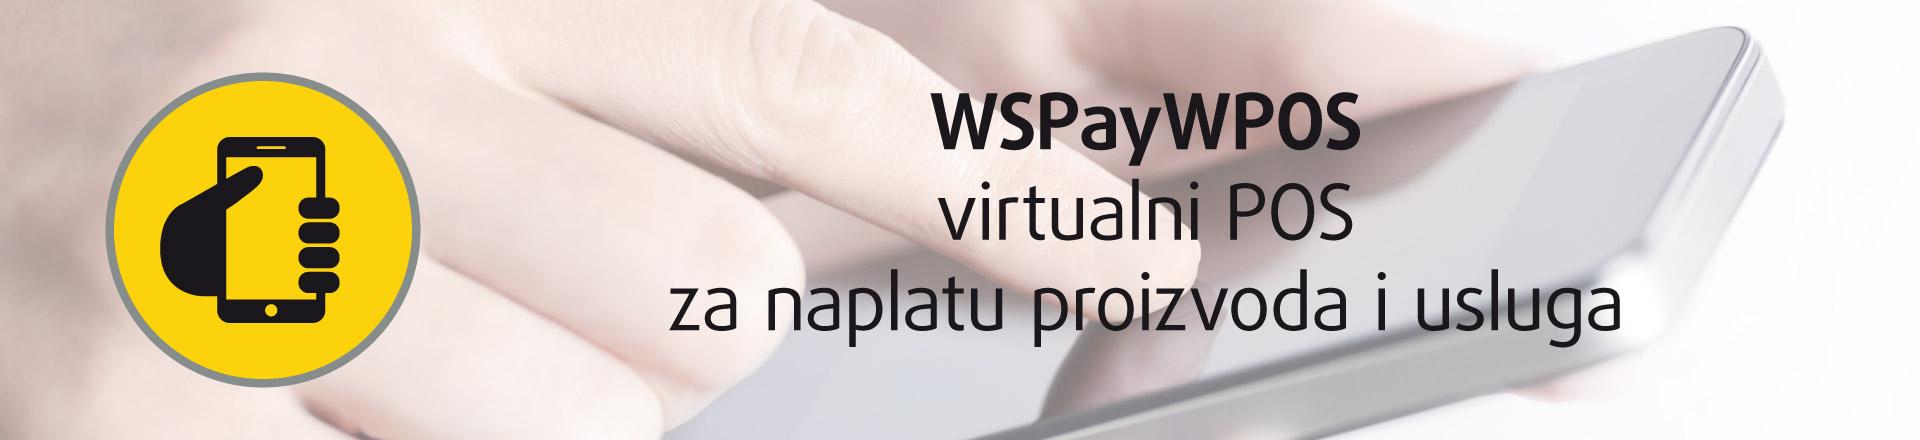 https://www.wspay.ba/Repository/Banners/WSPayWPOS-1920x440.jpg